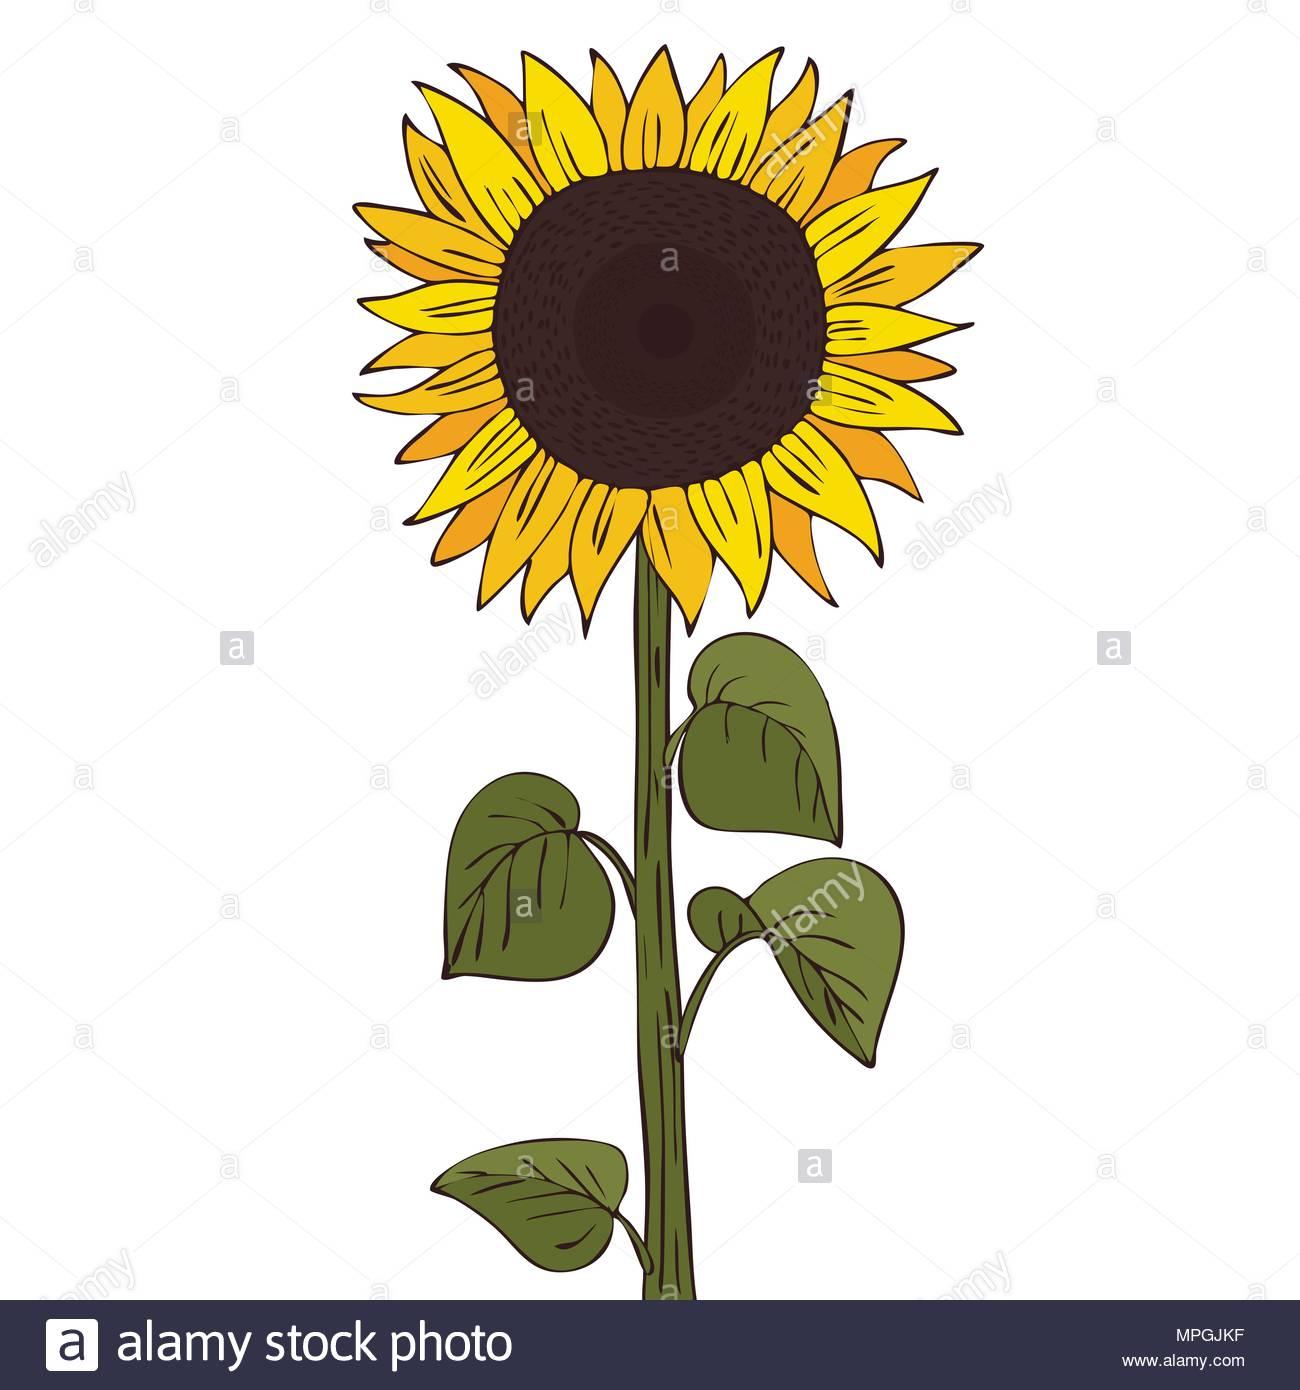 Cartoon Sunflower Stock Photos & Cartoon Sunflower Stock Images.